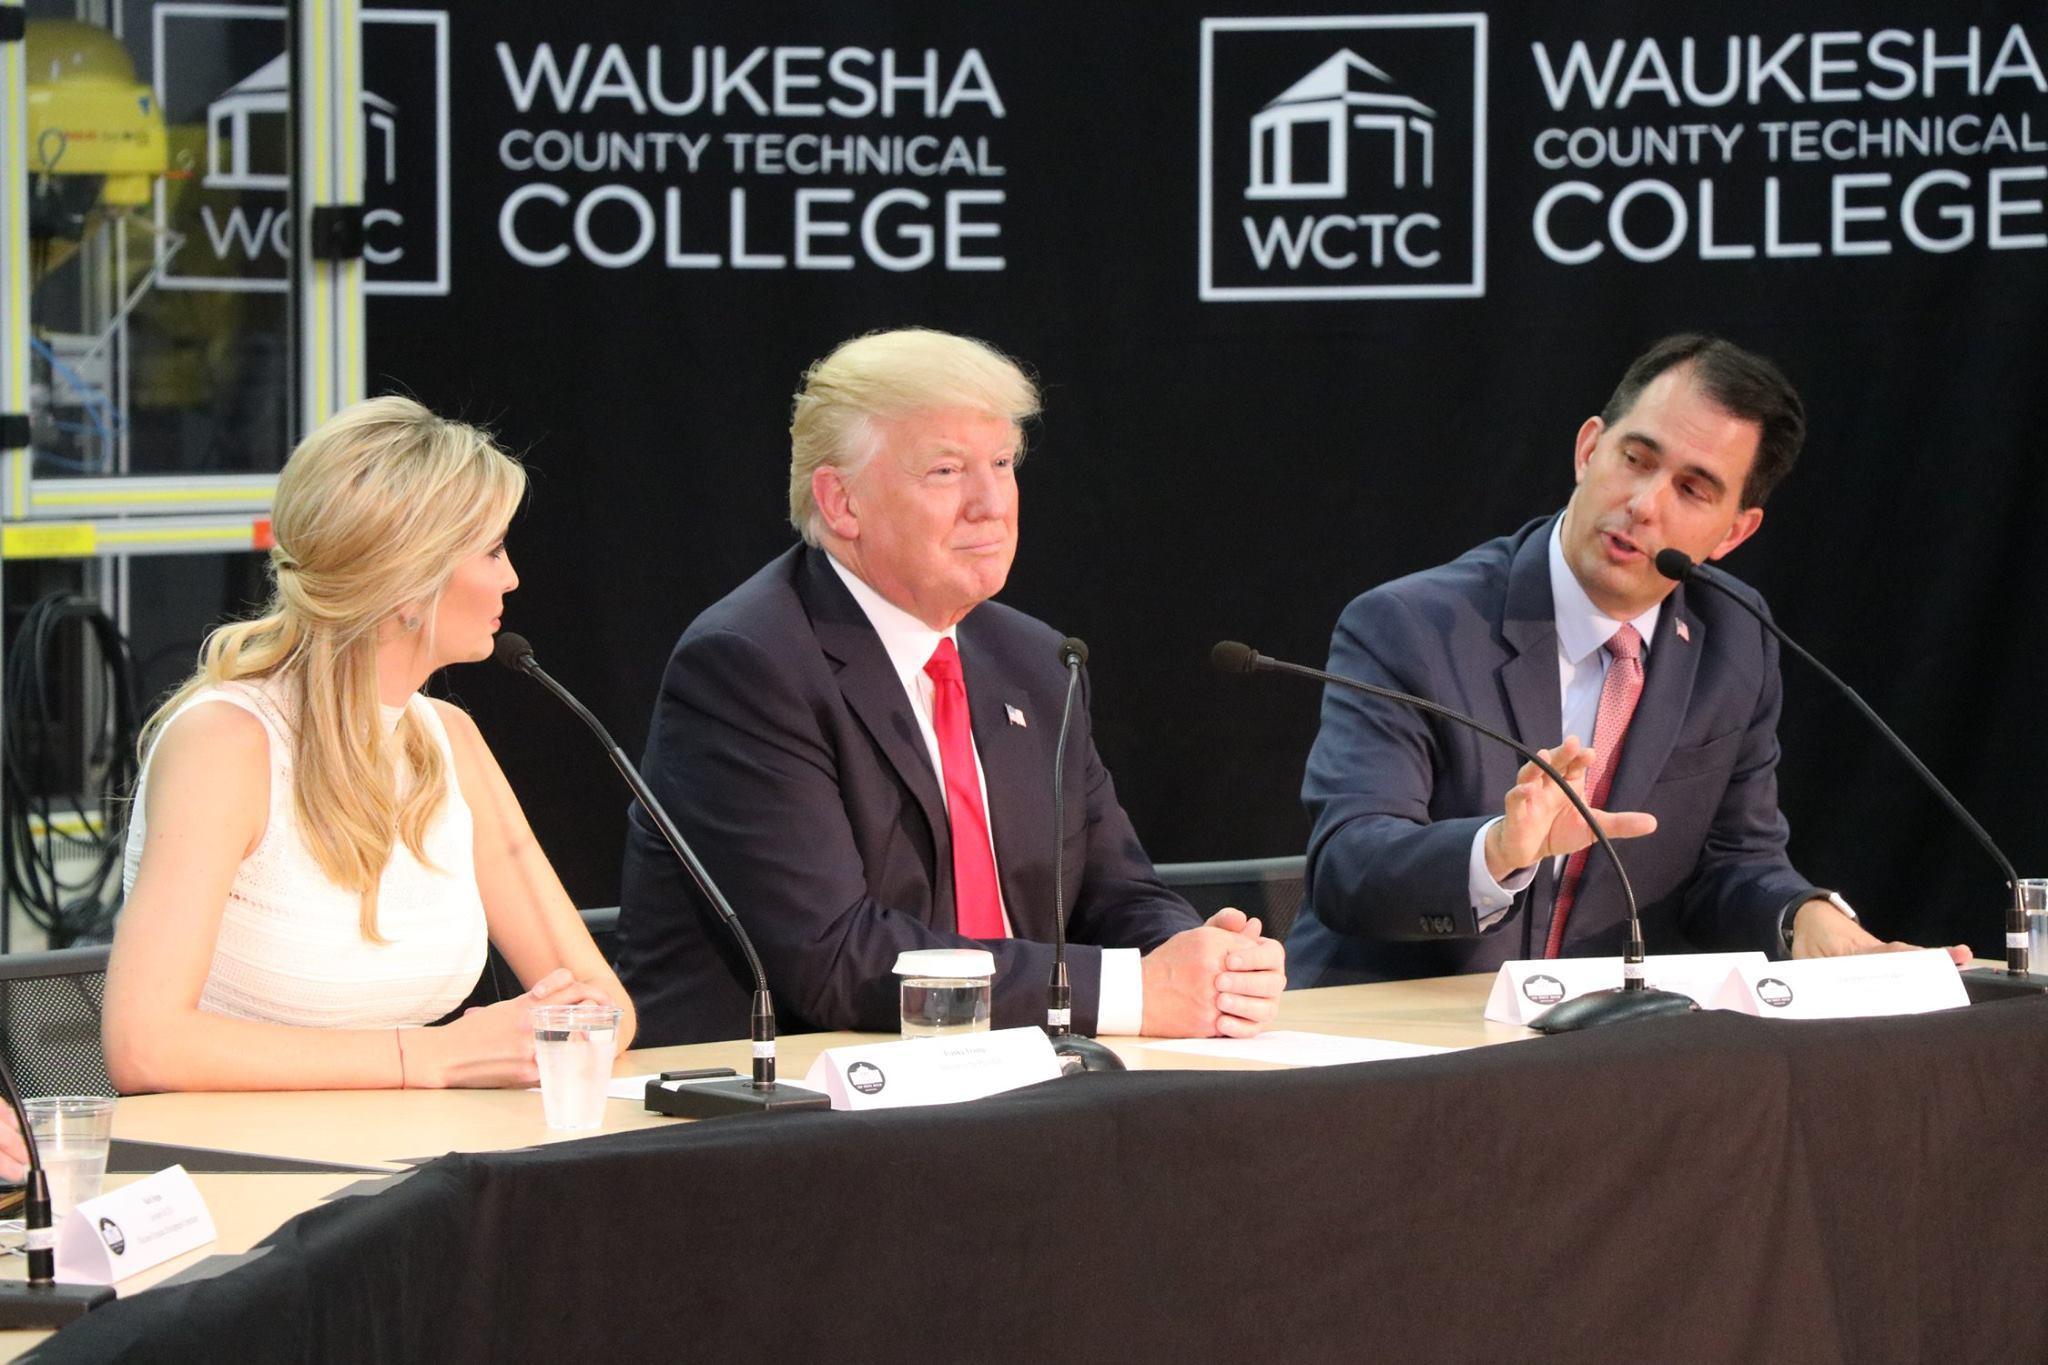 Trump to visit Wisconsin to fill skills gap